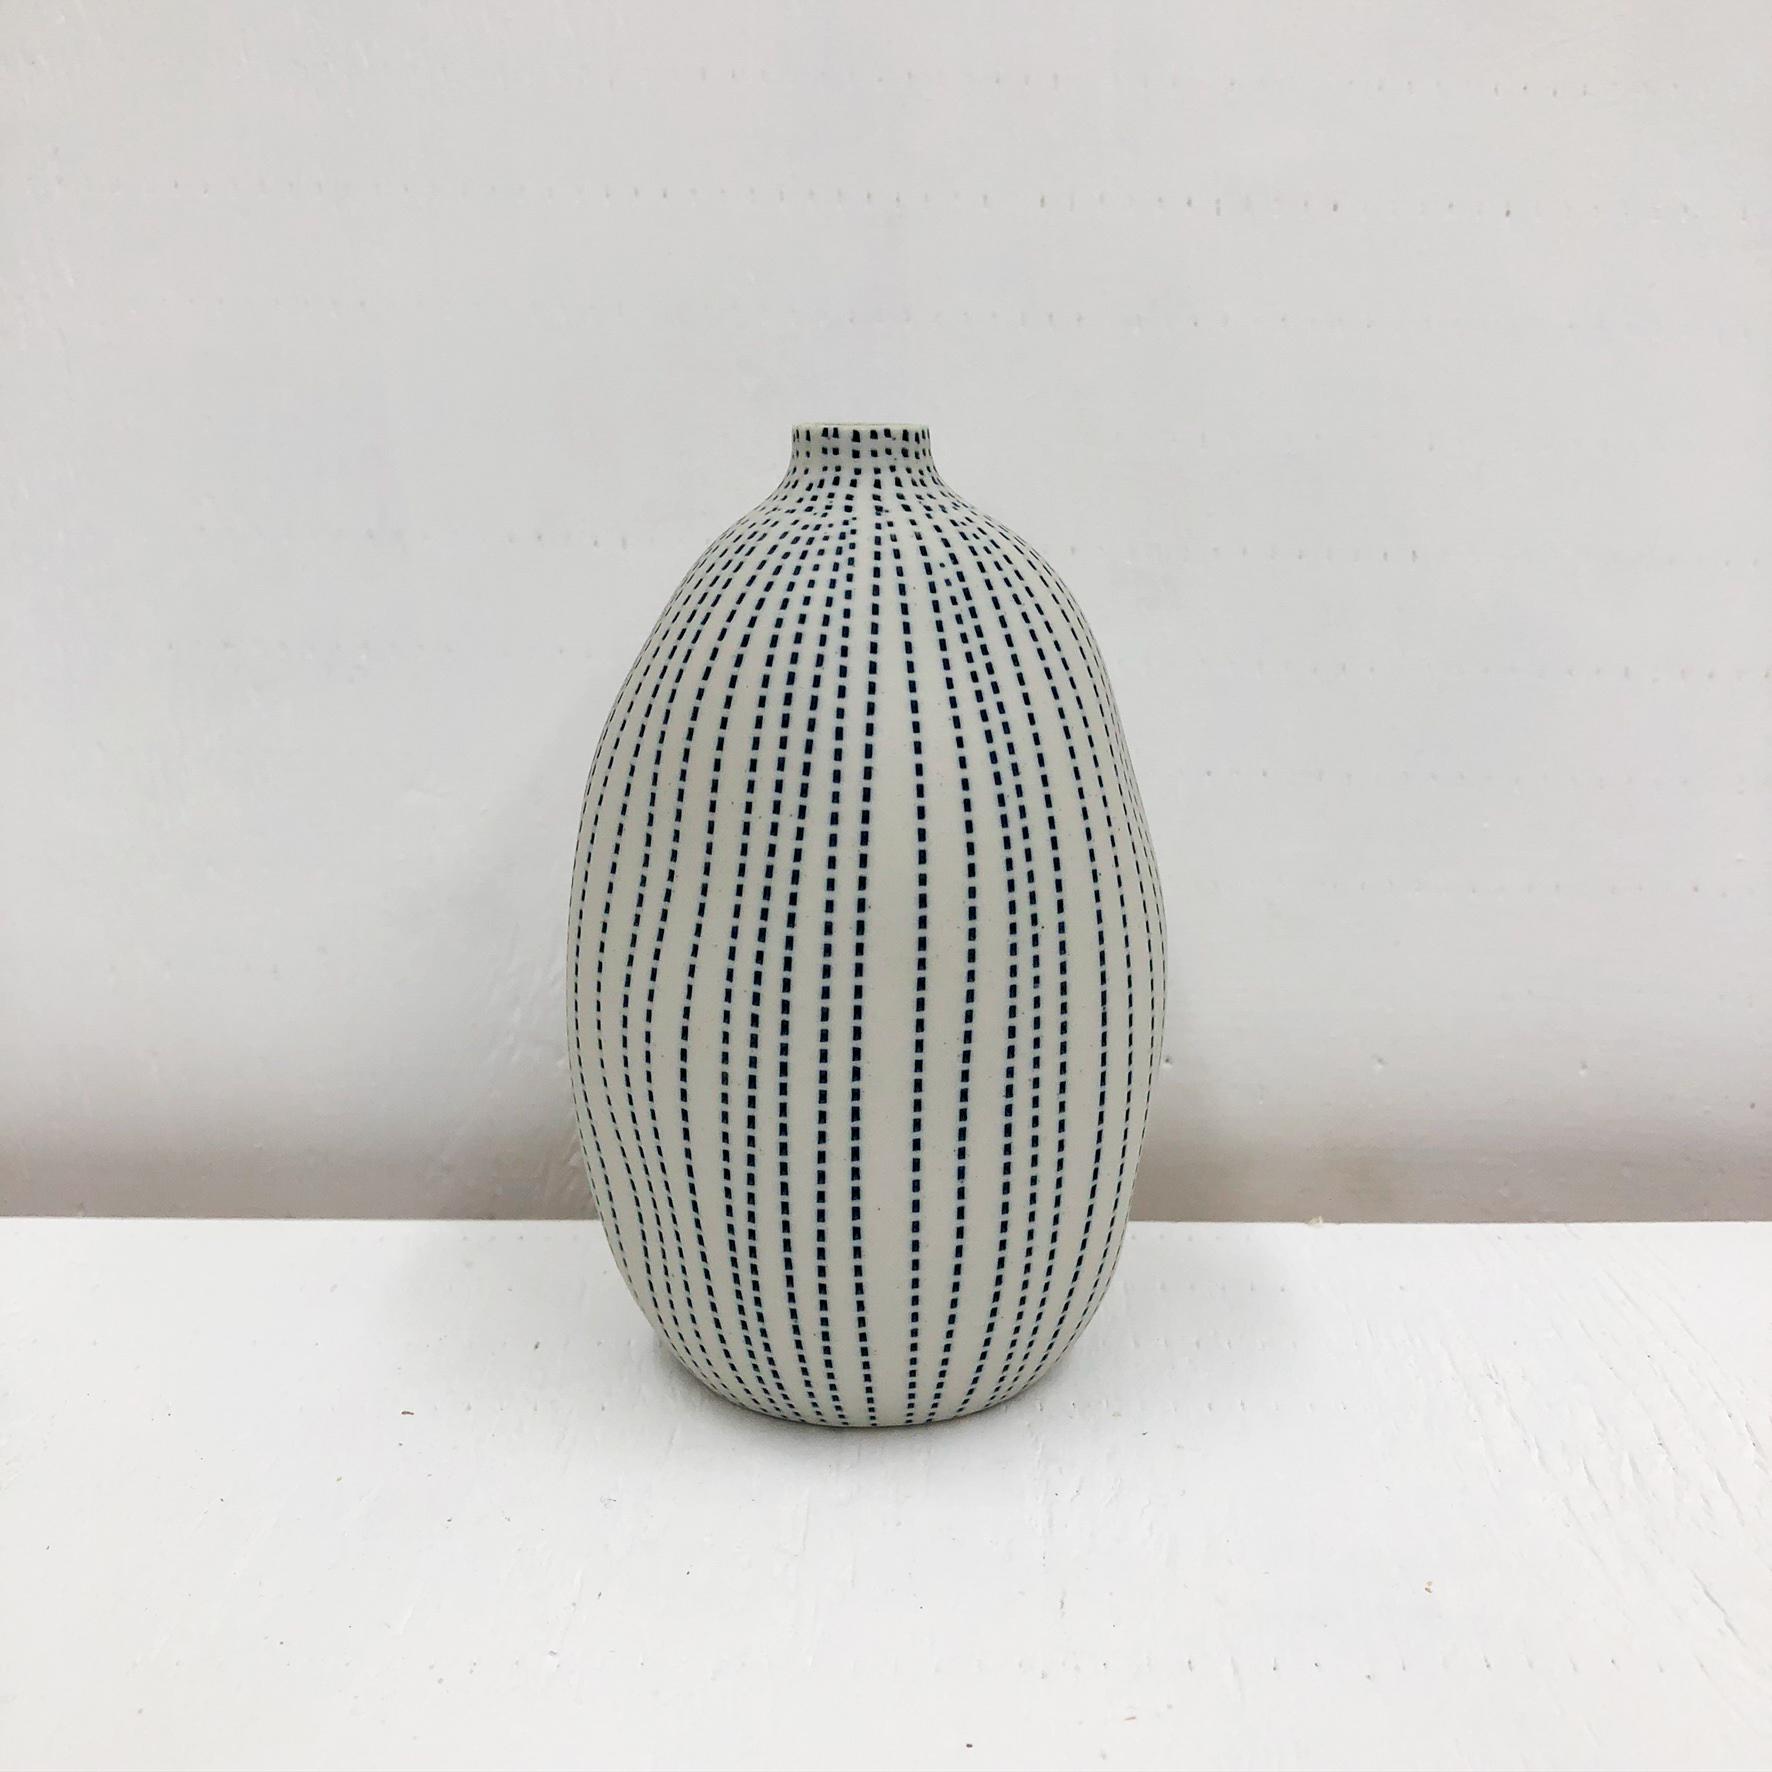 Gugu Sag L Handmade Vase - White & Blue Dots -empty